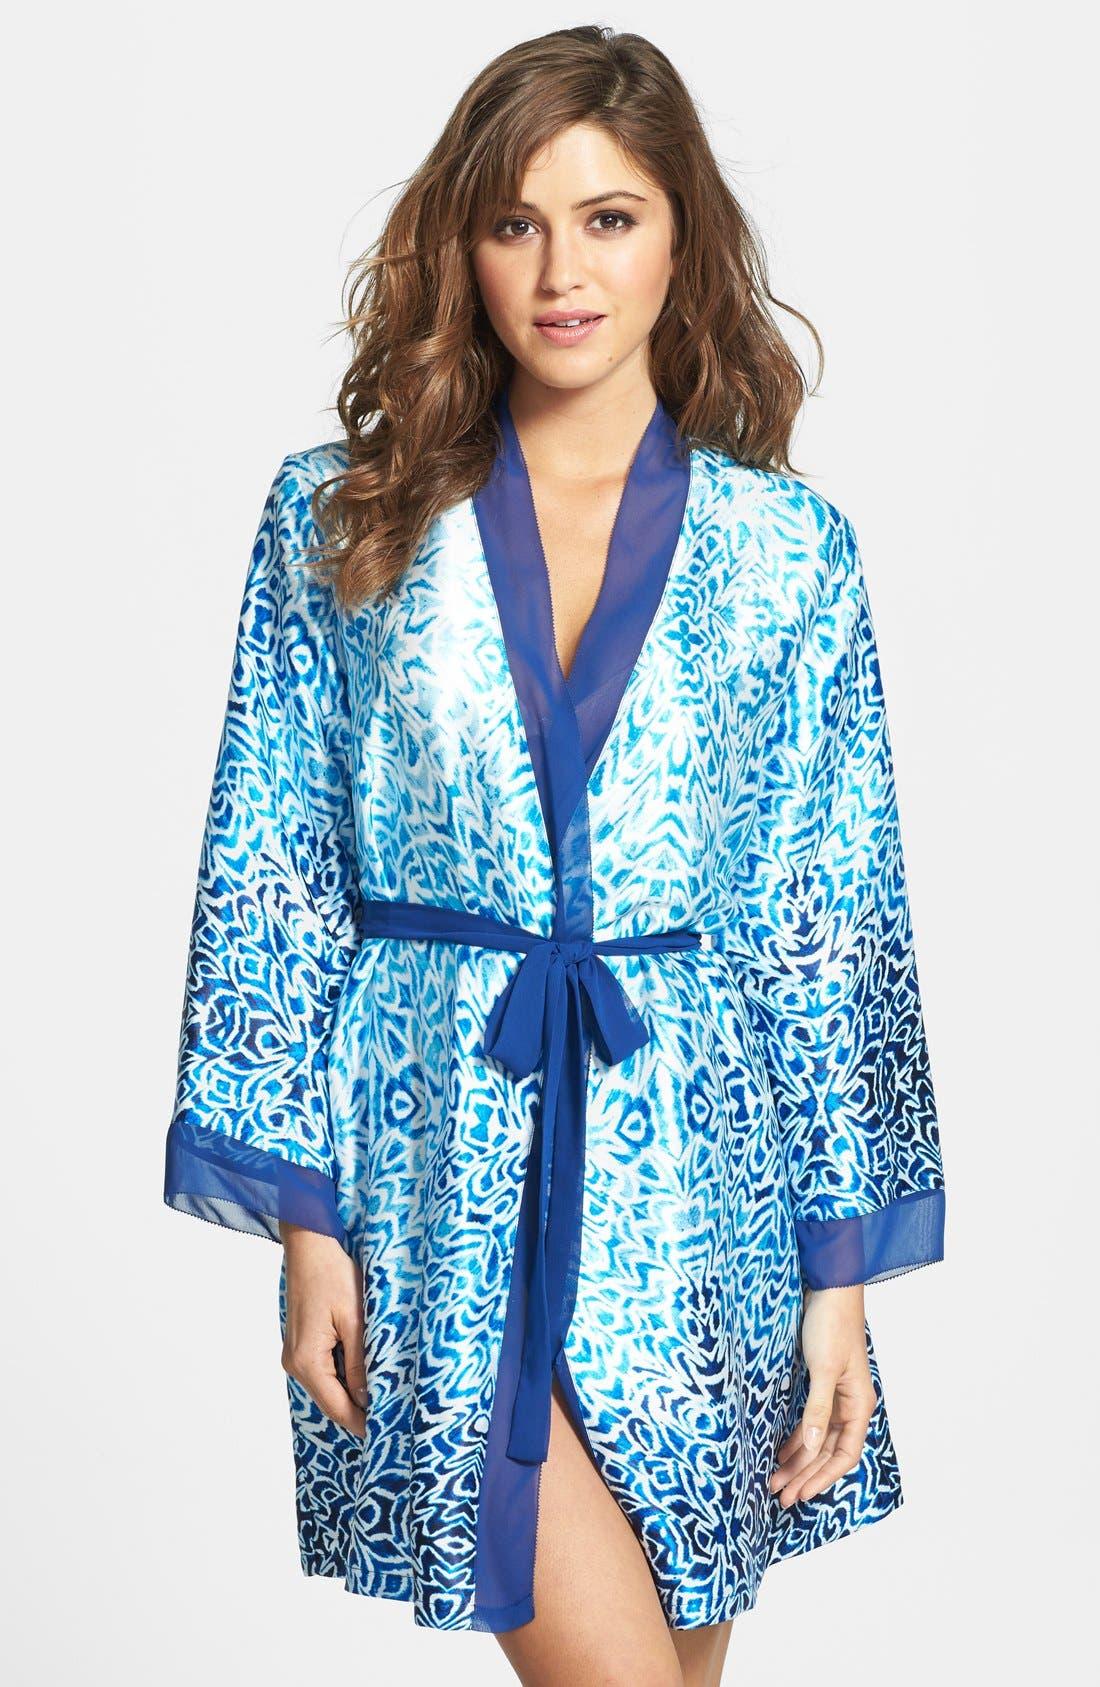 Alternate Image 1 Selected - Oscar de la Renta Sleepwear 'Ocean Breeze' Satin Charmeuse Wrap Robe